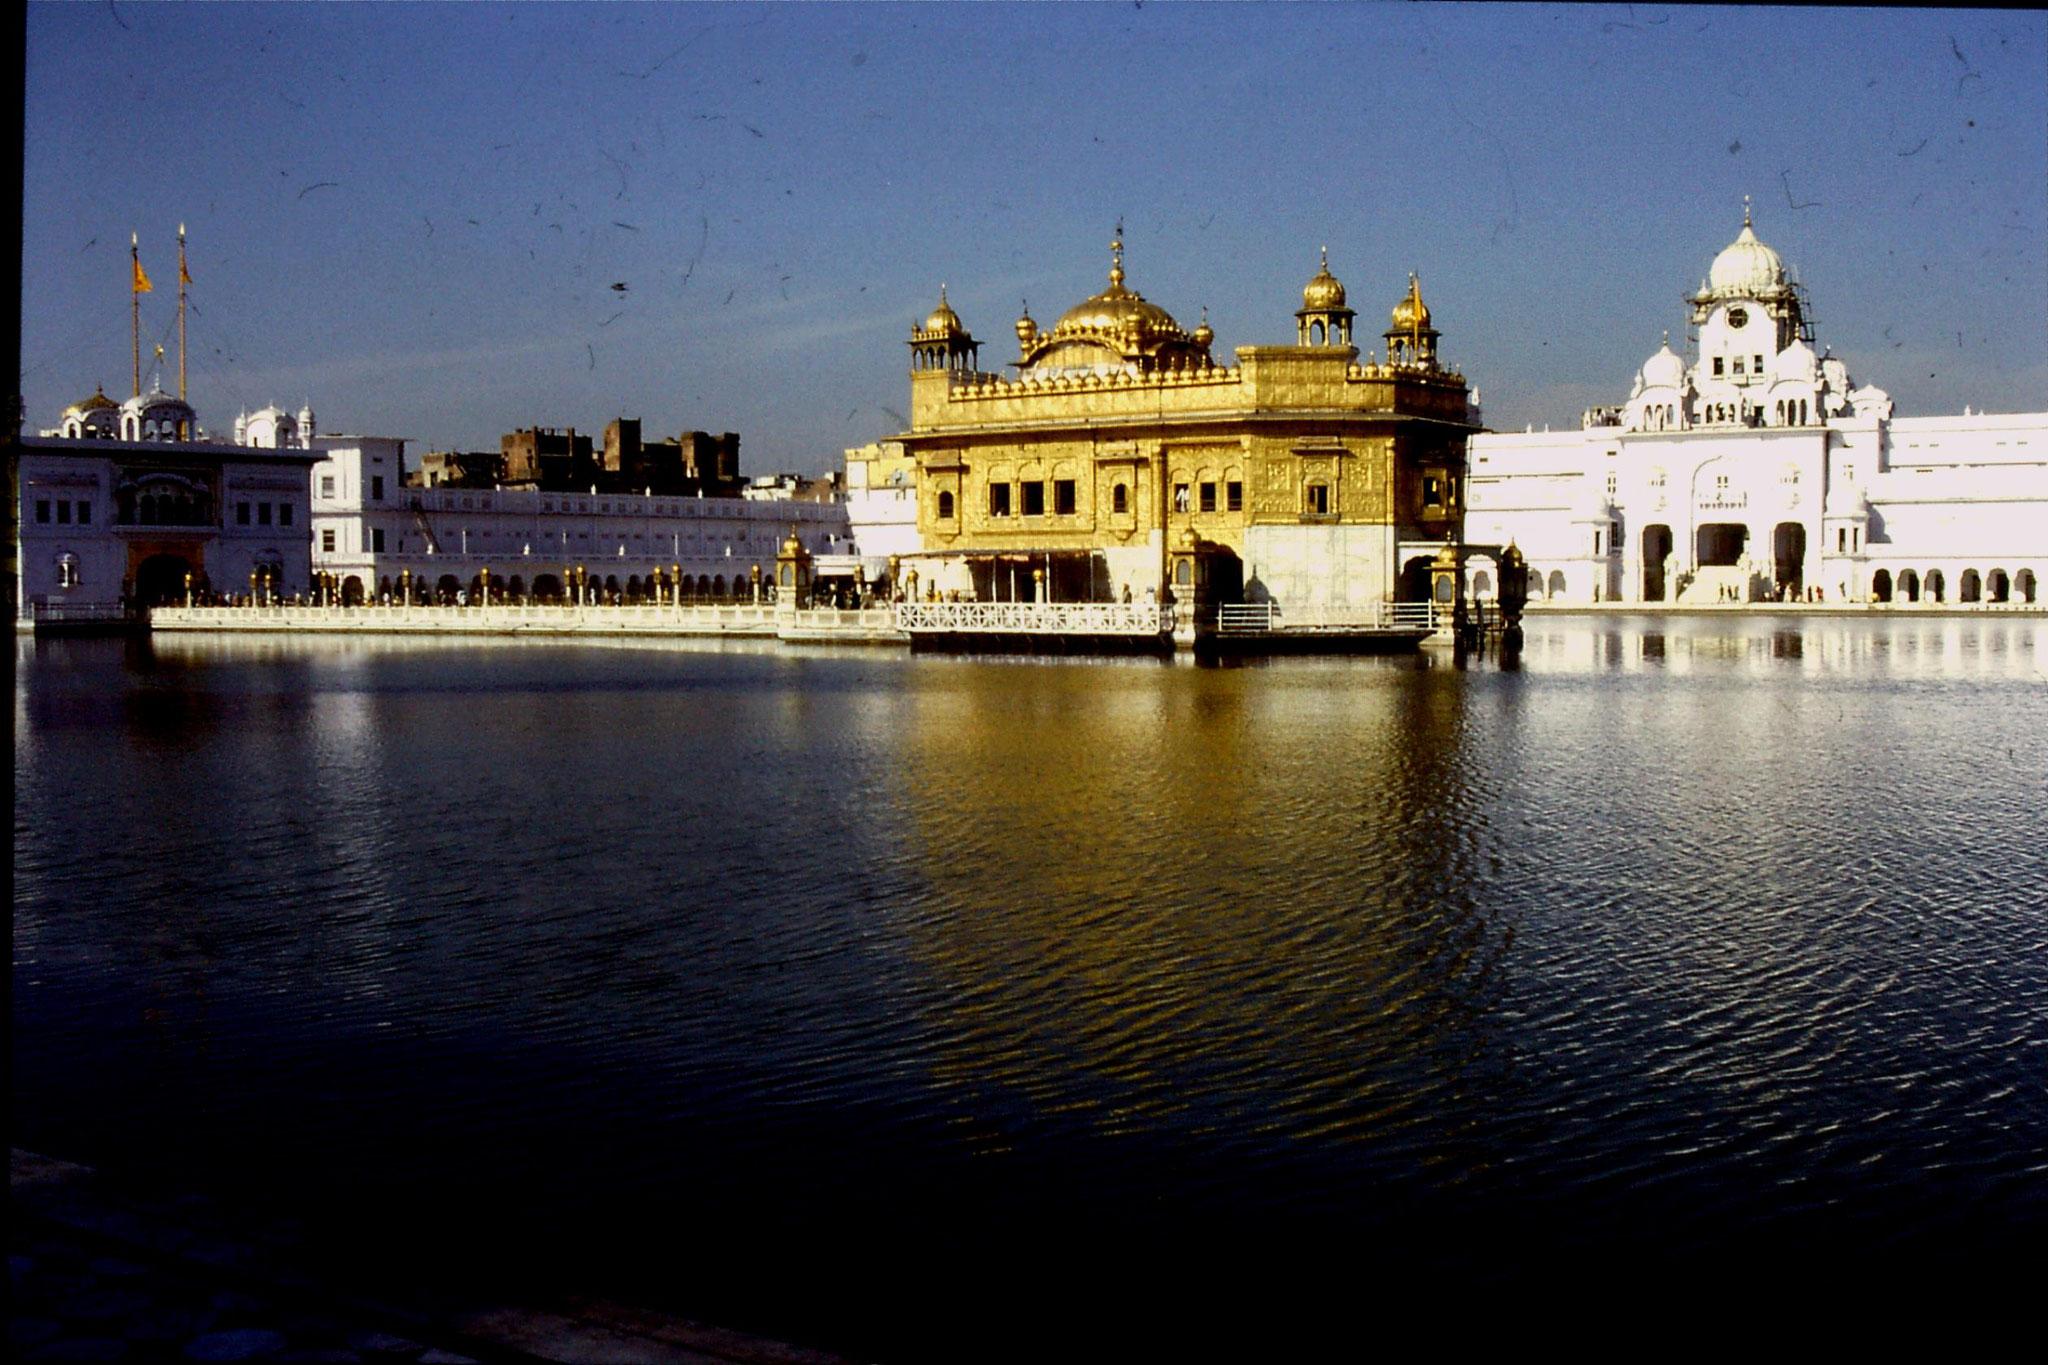 17/11/1989: 13: Amritsar Golden Temple